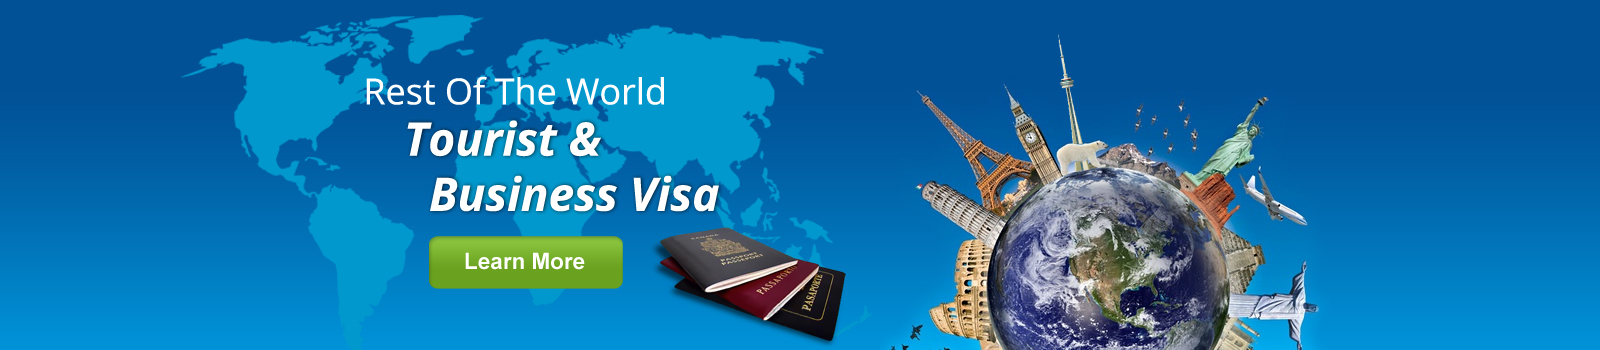 Vsa dubai singapore hong kong business and tourist visa reheart Image collections